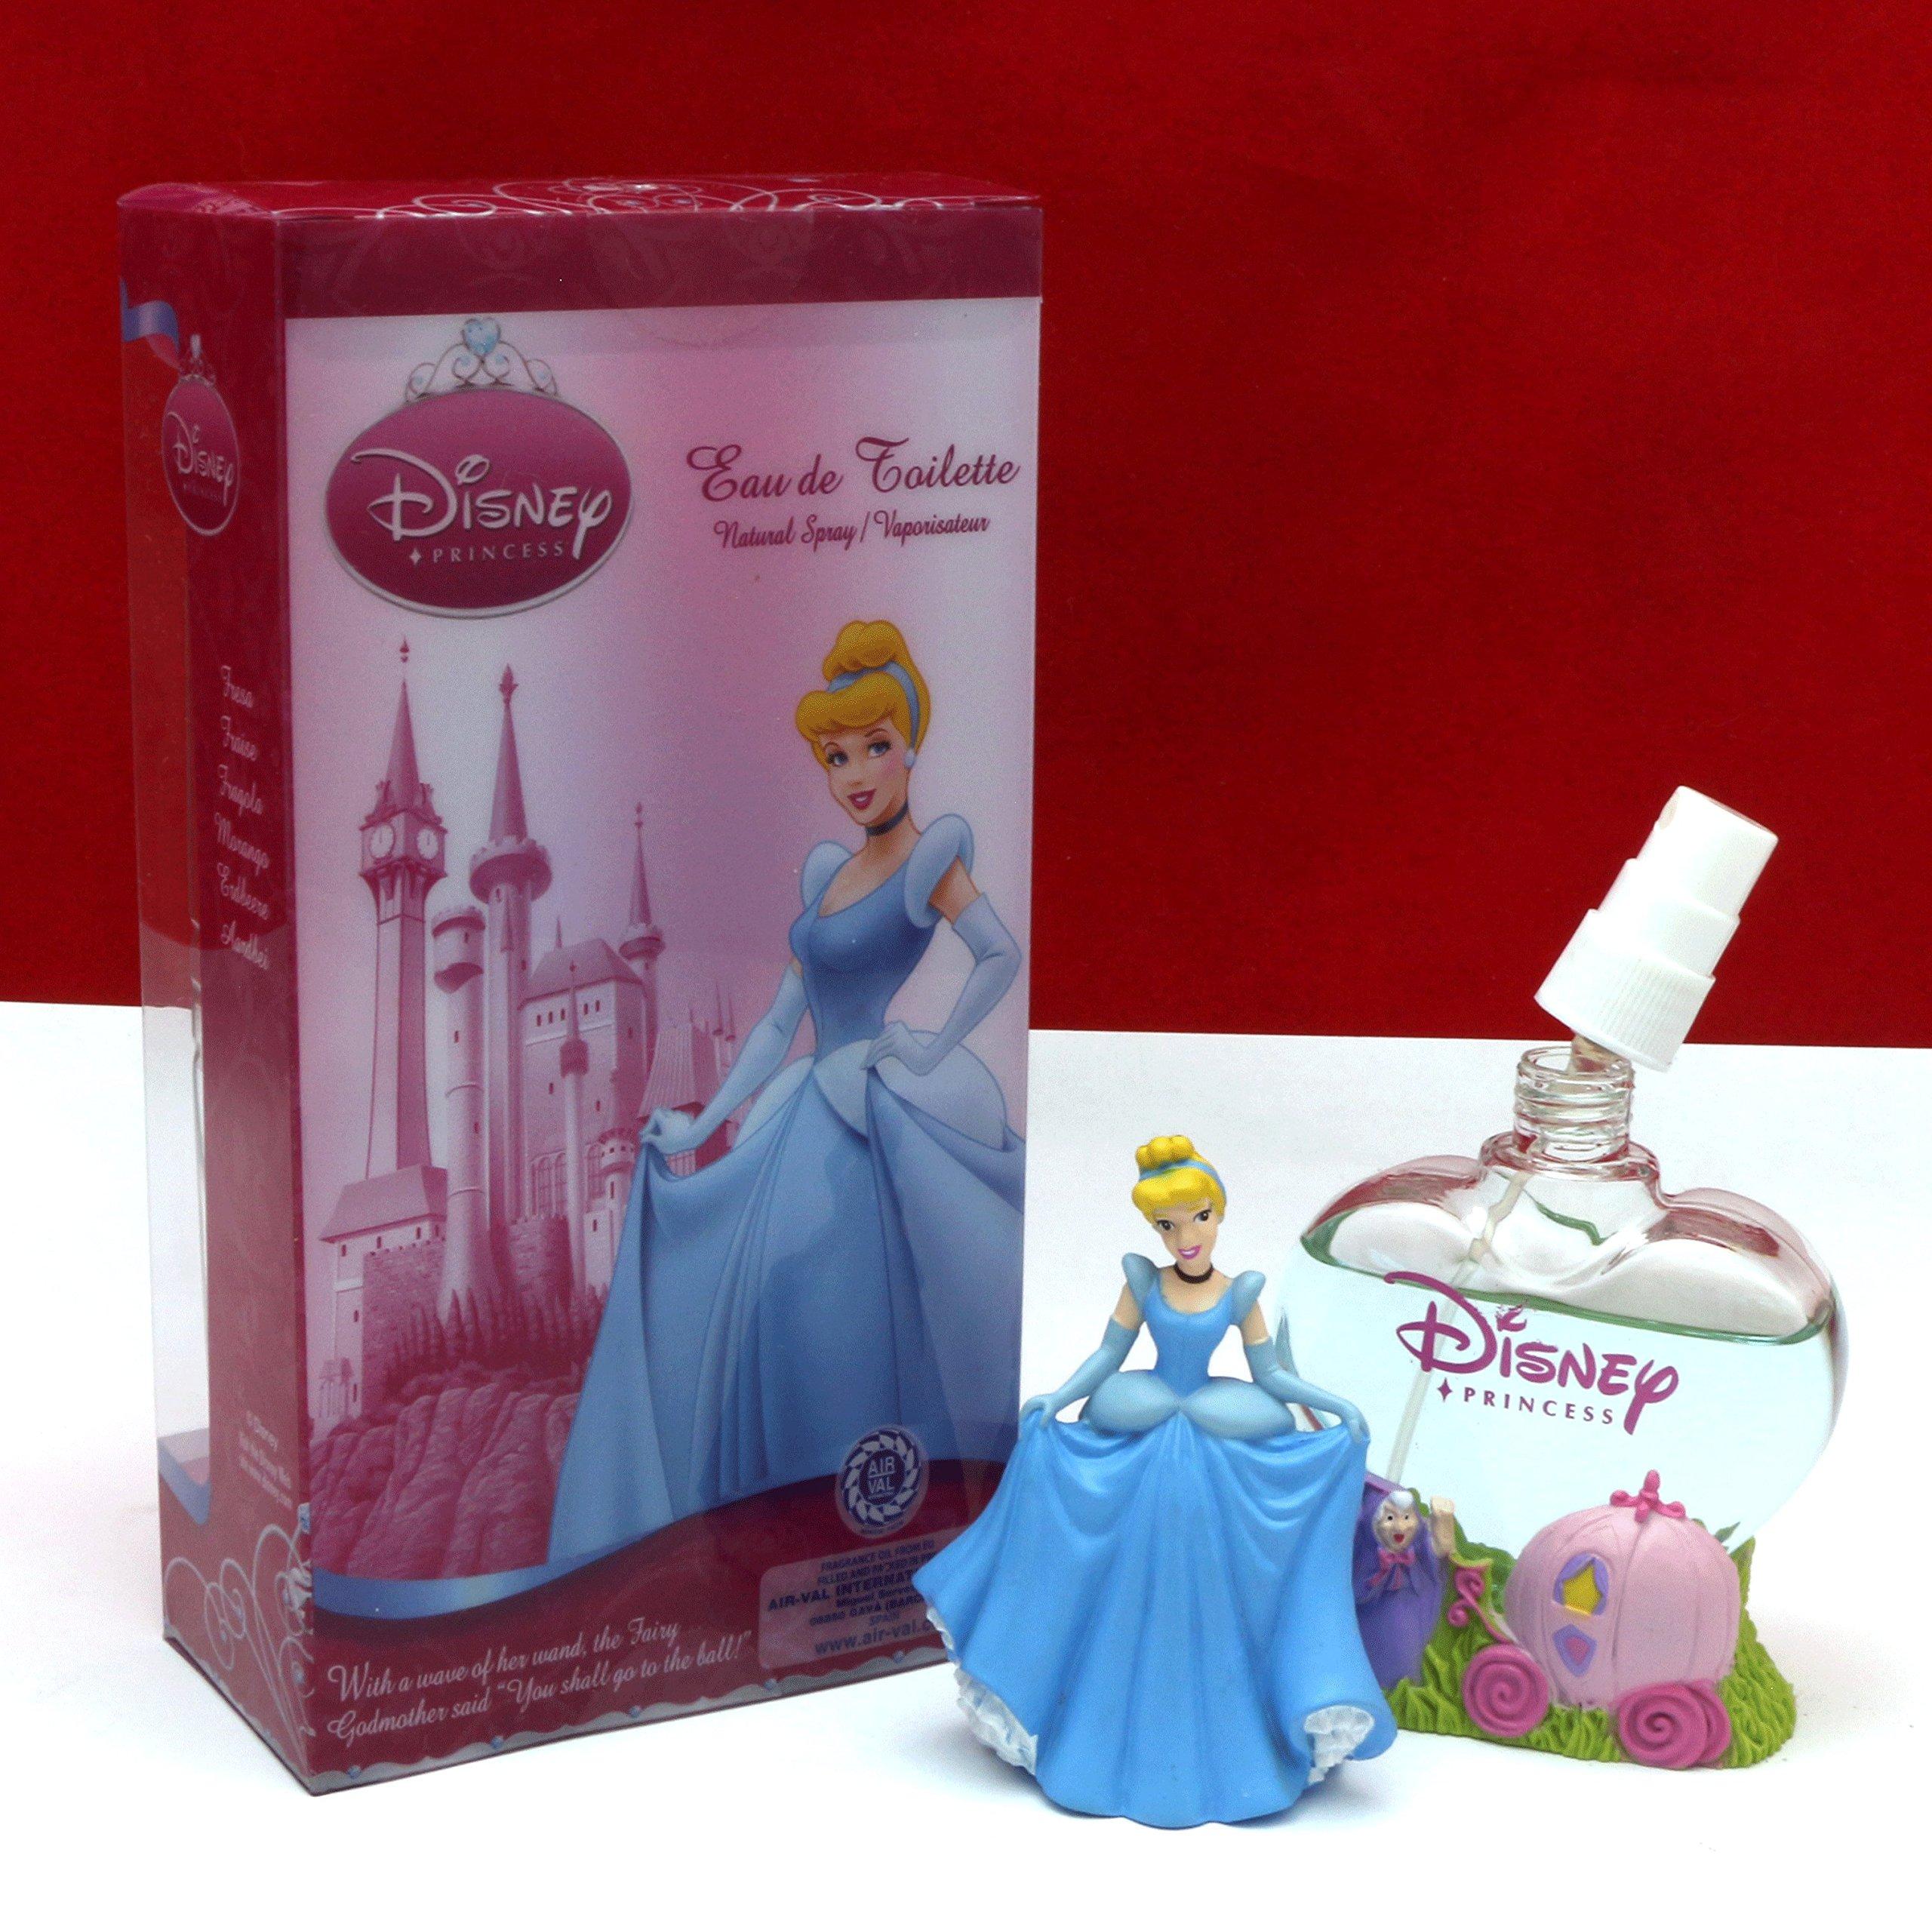 Disney Princess Cinderella (Refillable Bottle) For Girls, Kids Eau De Toilette Spray 1.7 oz / 50 ml